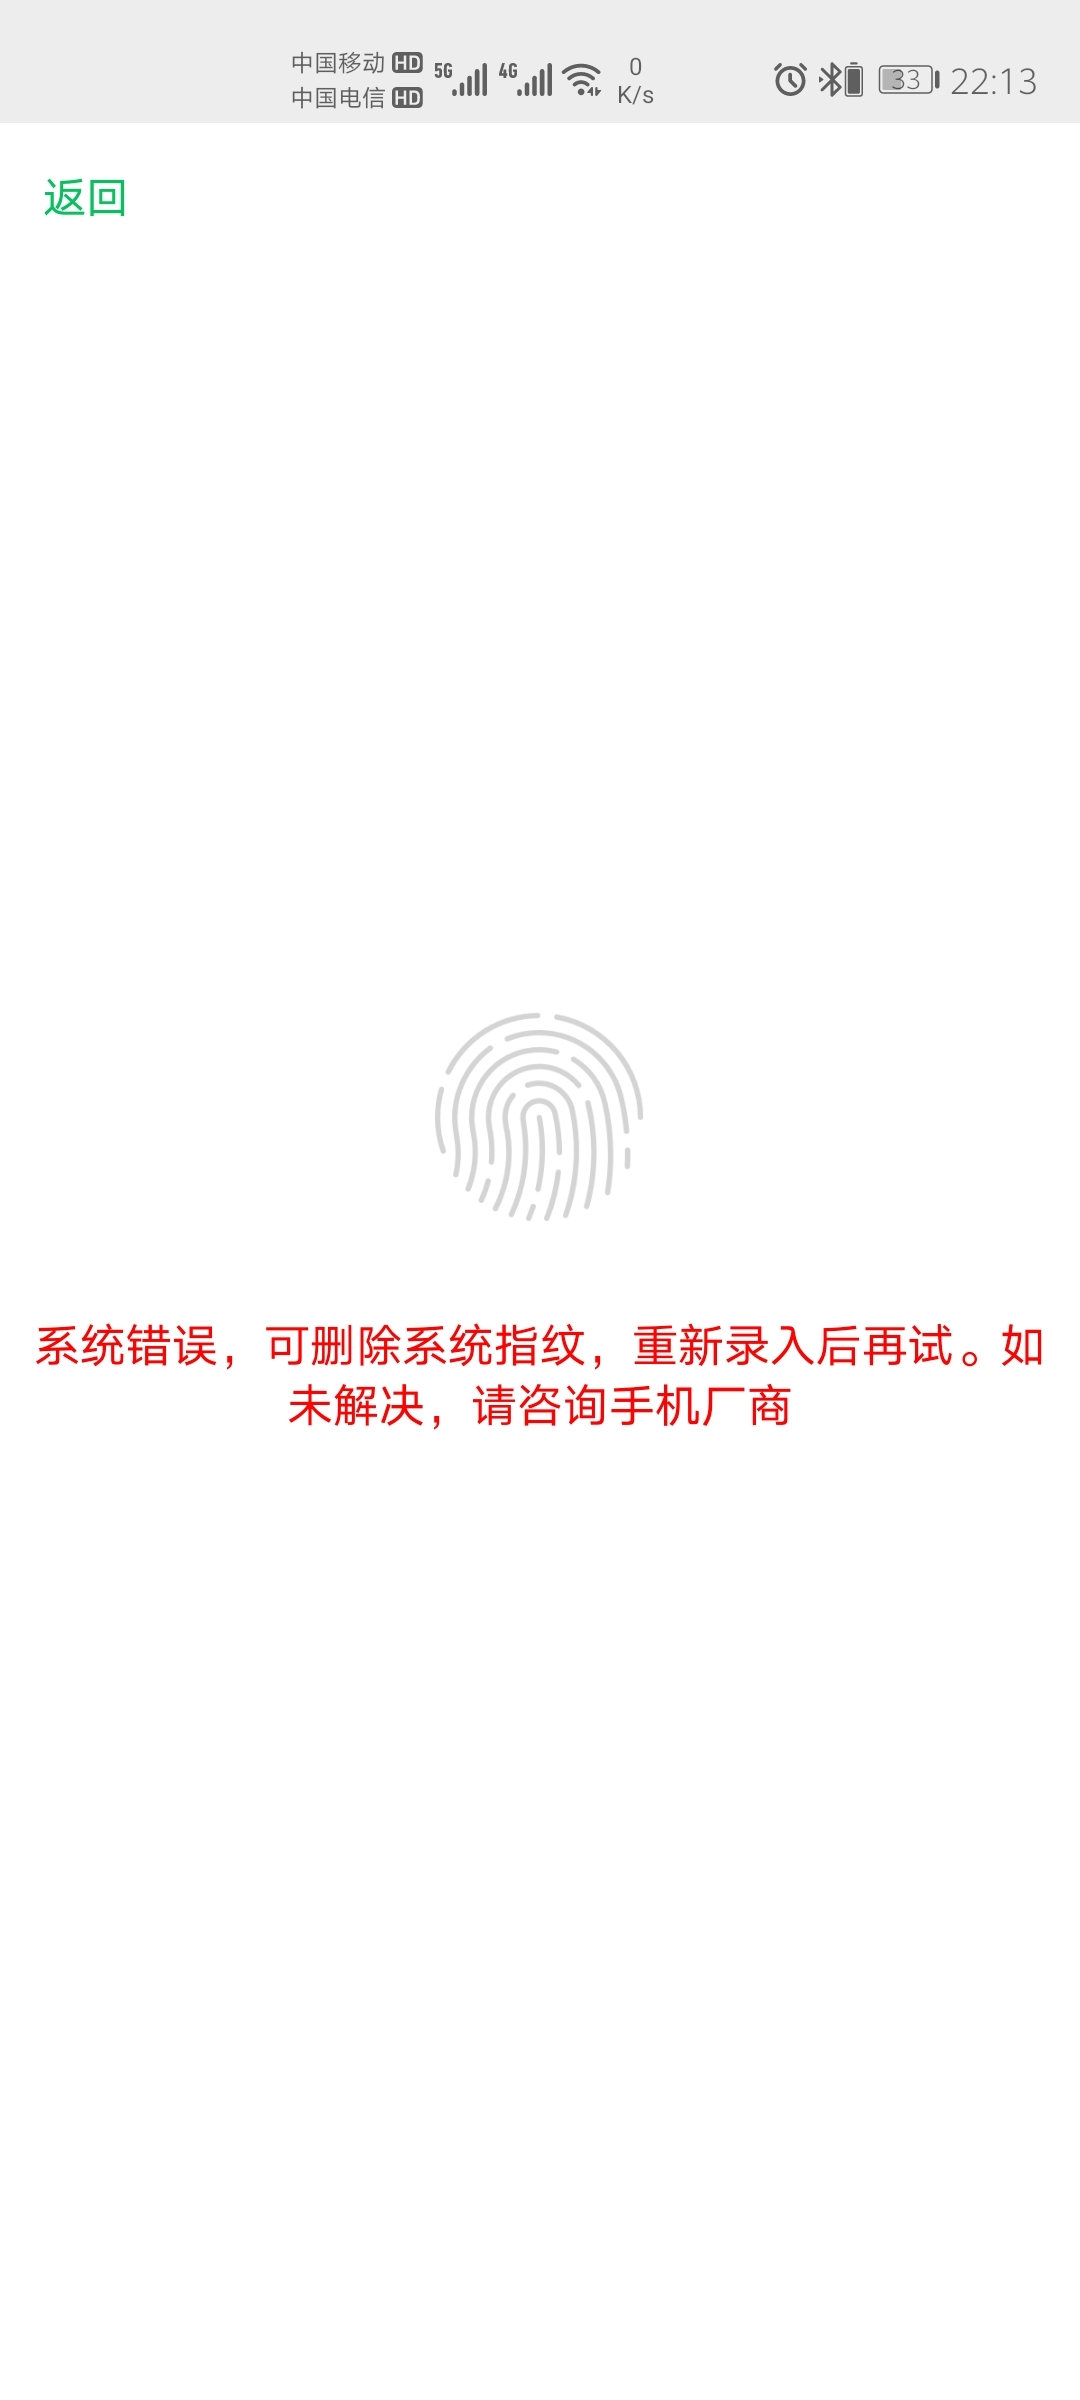 Screenshot_20201021_221346_com.tencent.mm.jpg